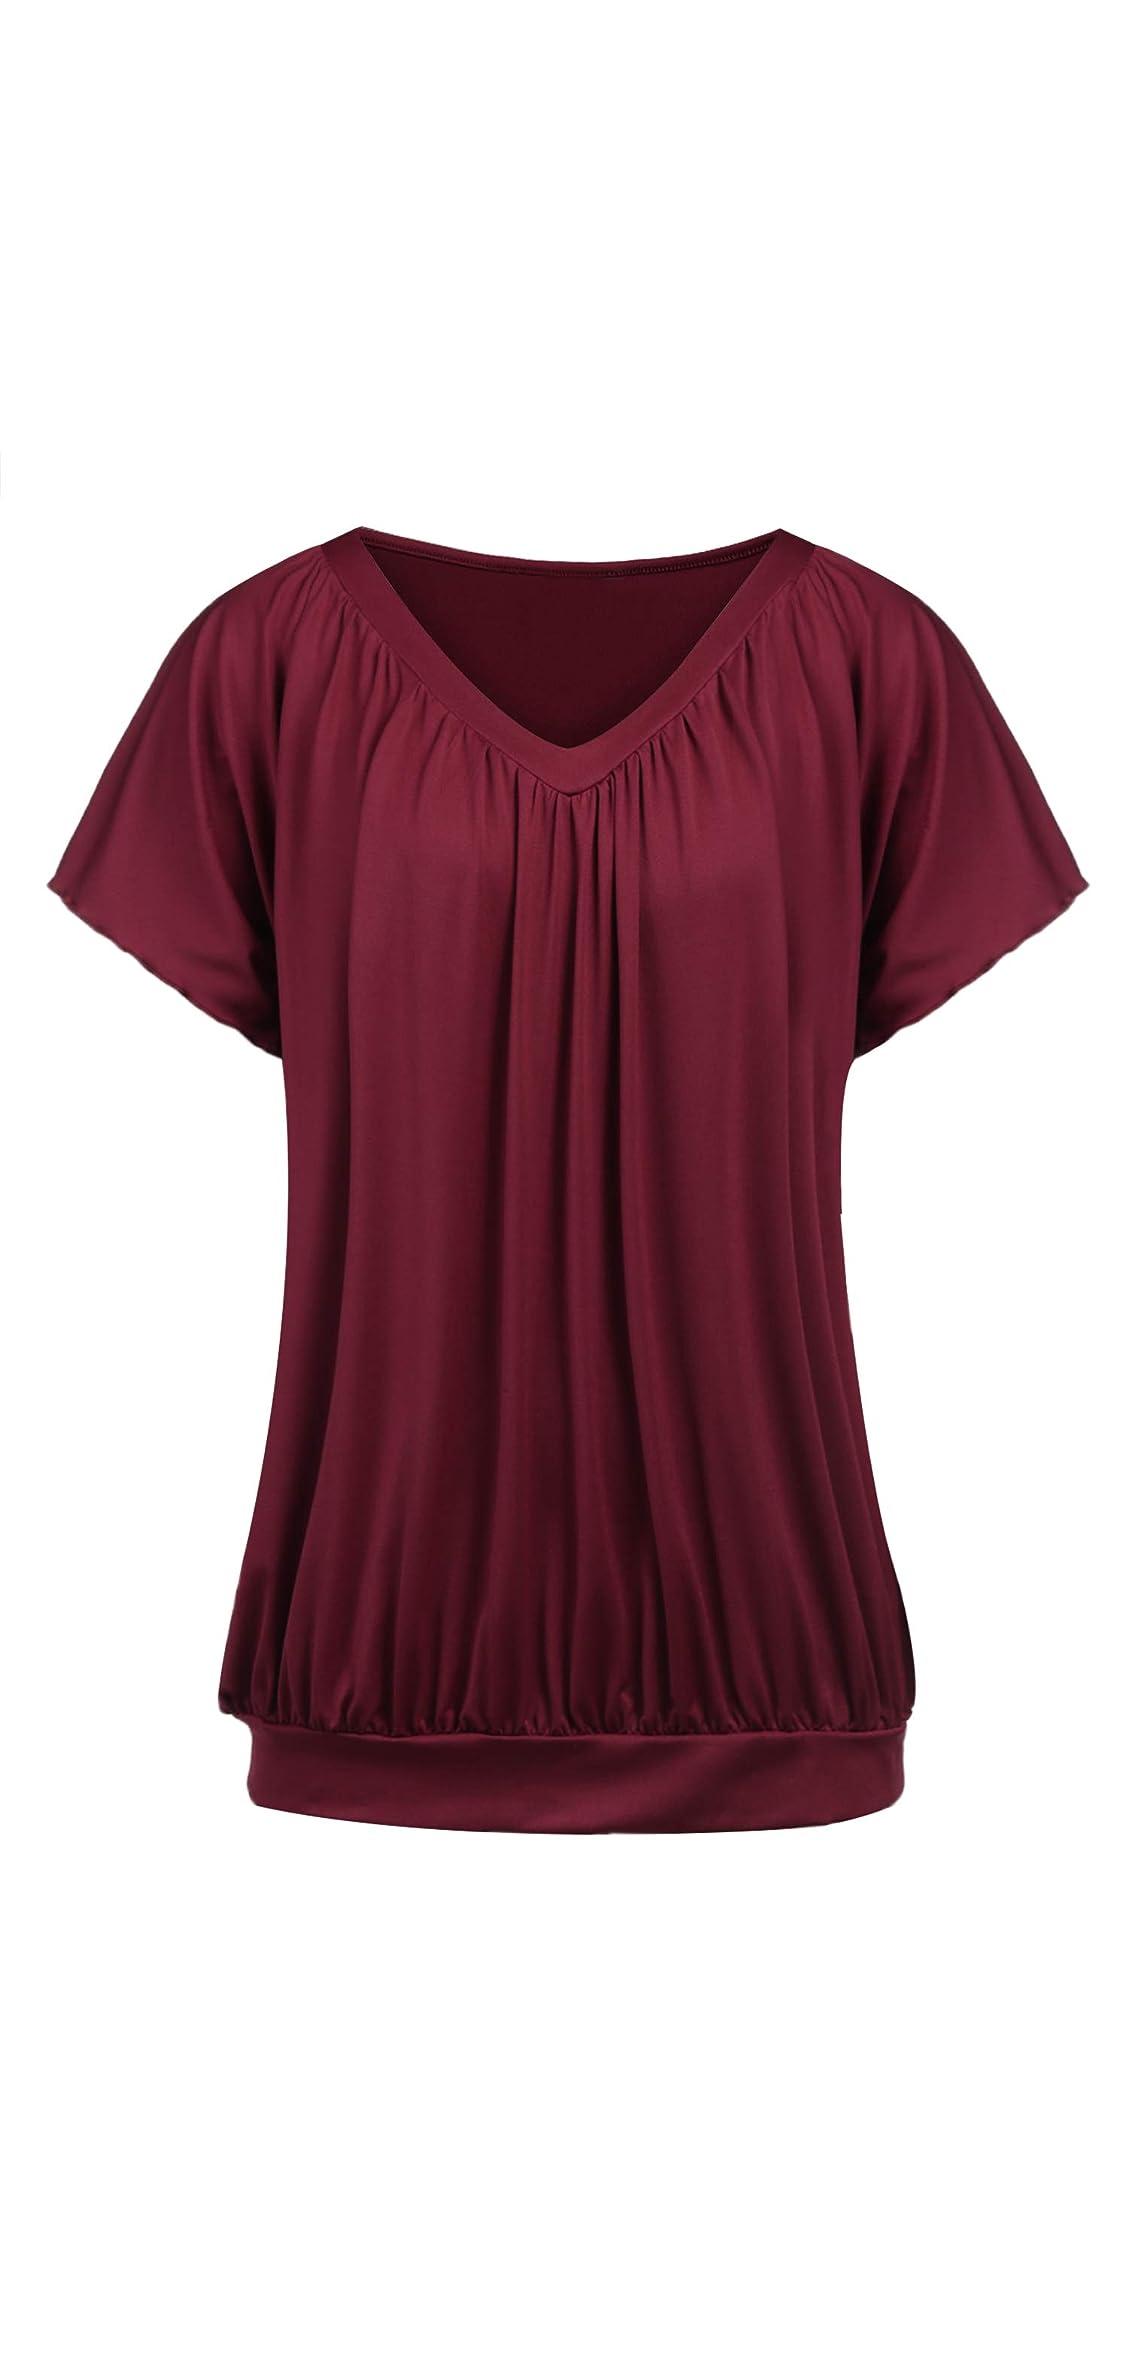 Women Plus Size Blouse Short Sleeve V Neck Blouse Top